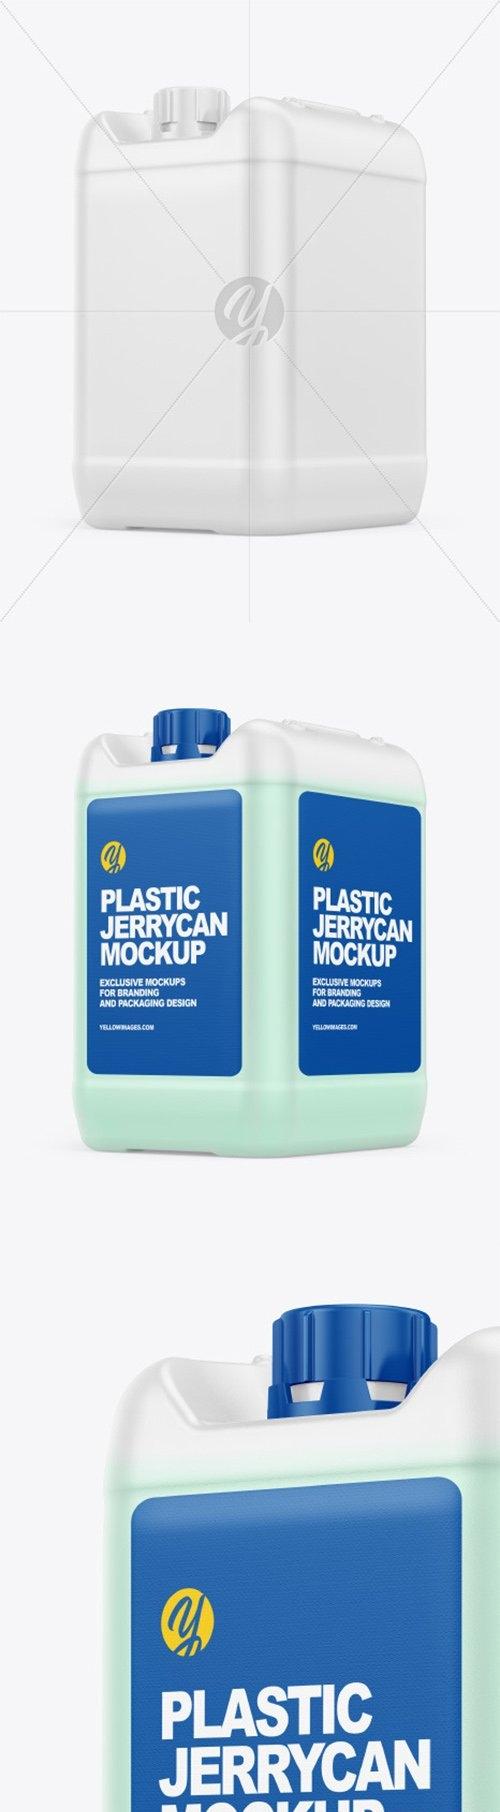 Plastic Jerrycan with Liquid Mockup 66512